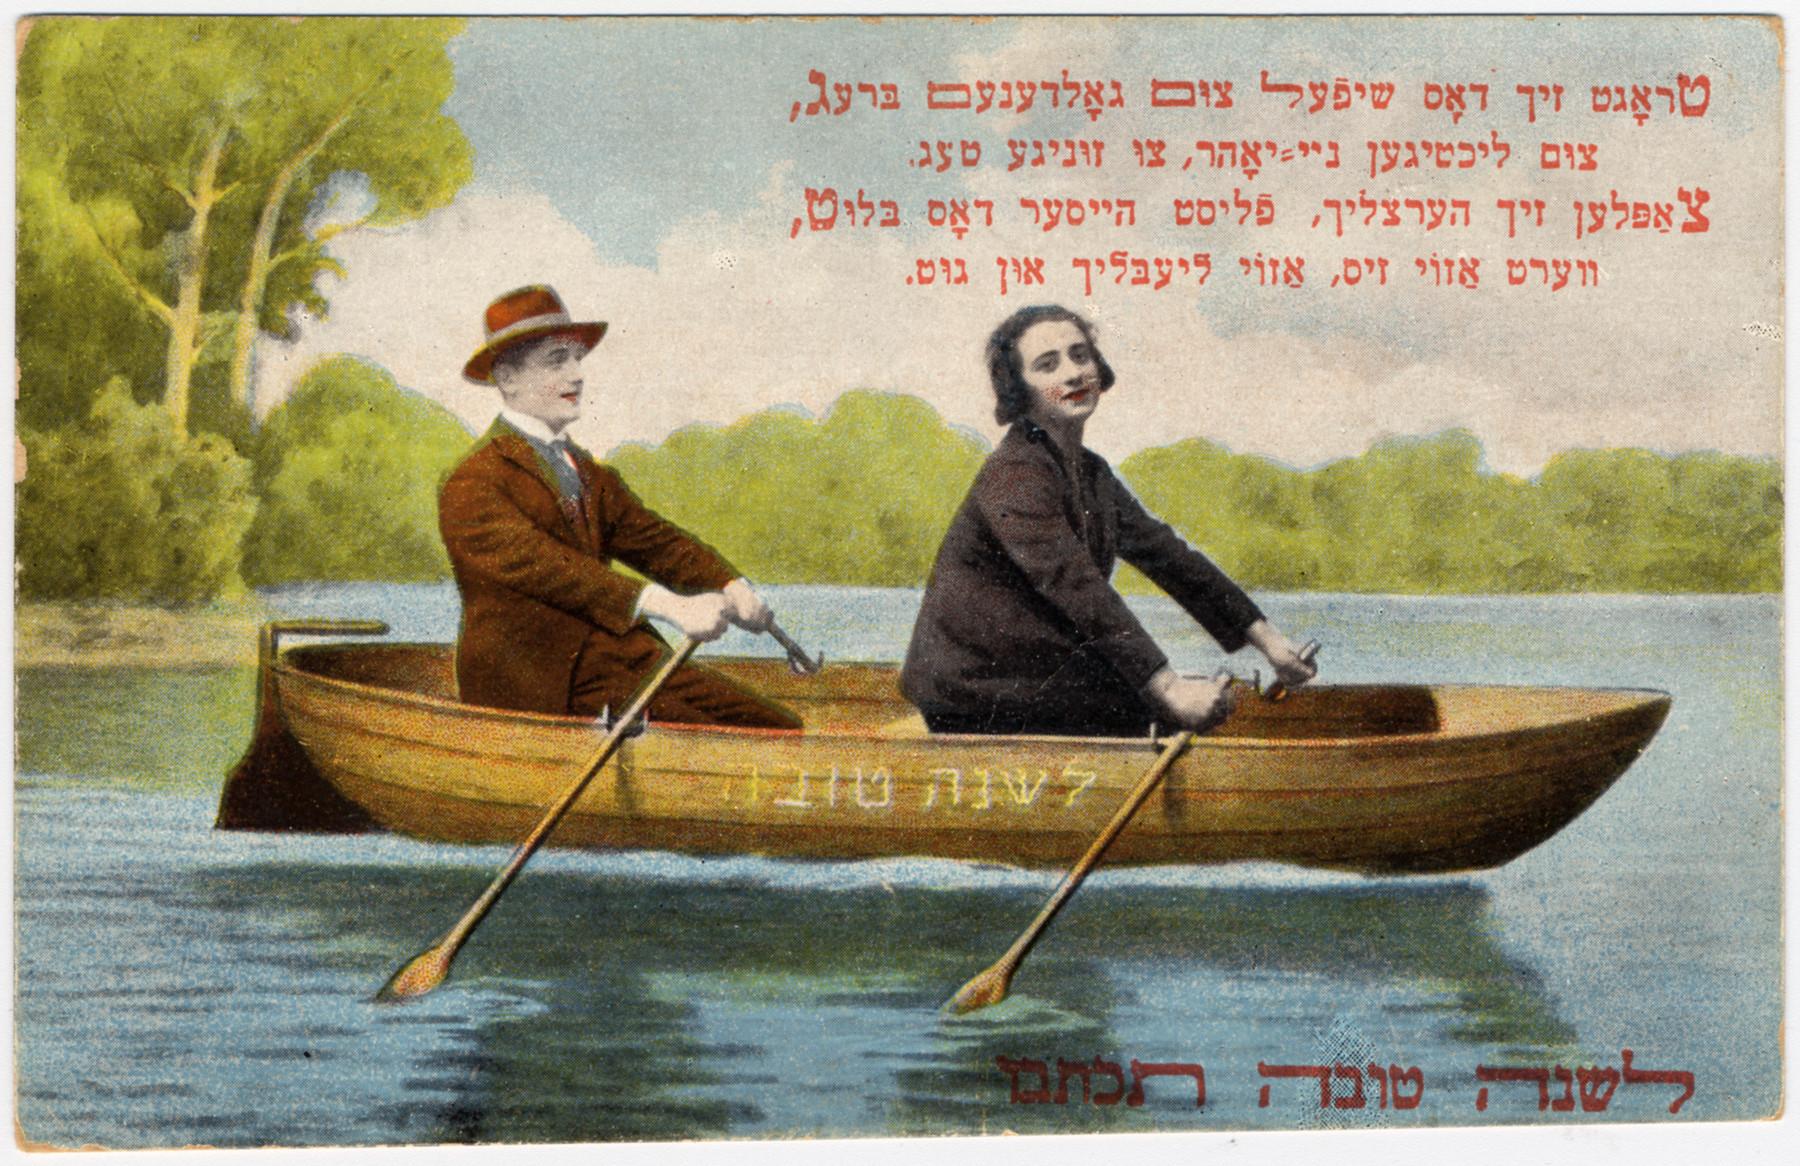 Israel Dauerman Klinghoffer wishes his wife, Ida Grabel, a happy new year in this postcard.